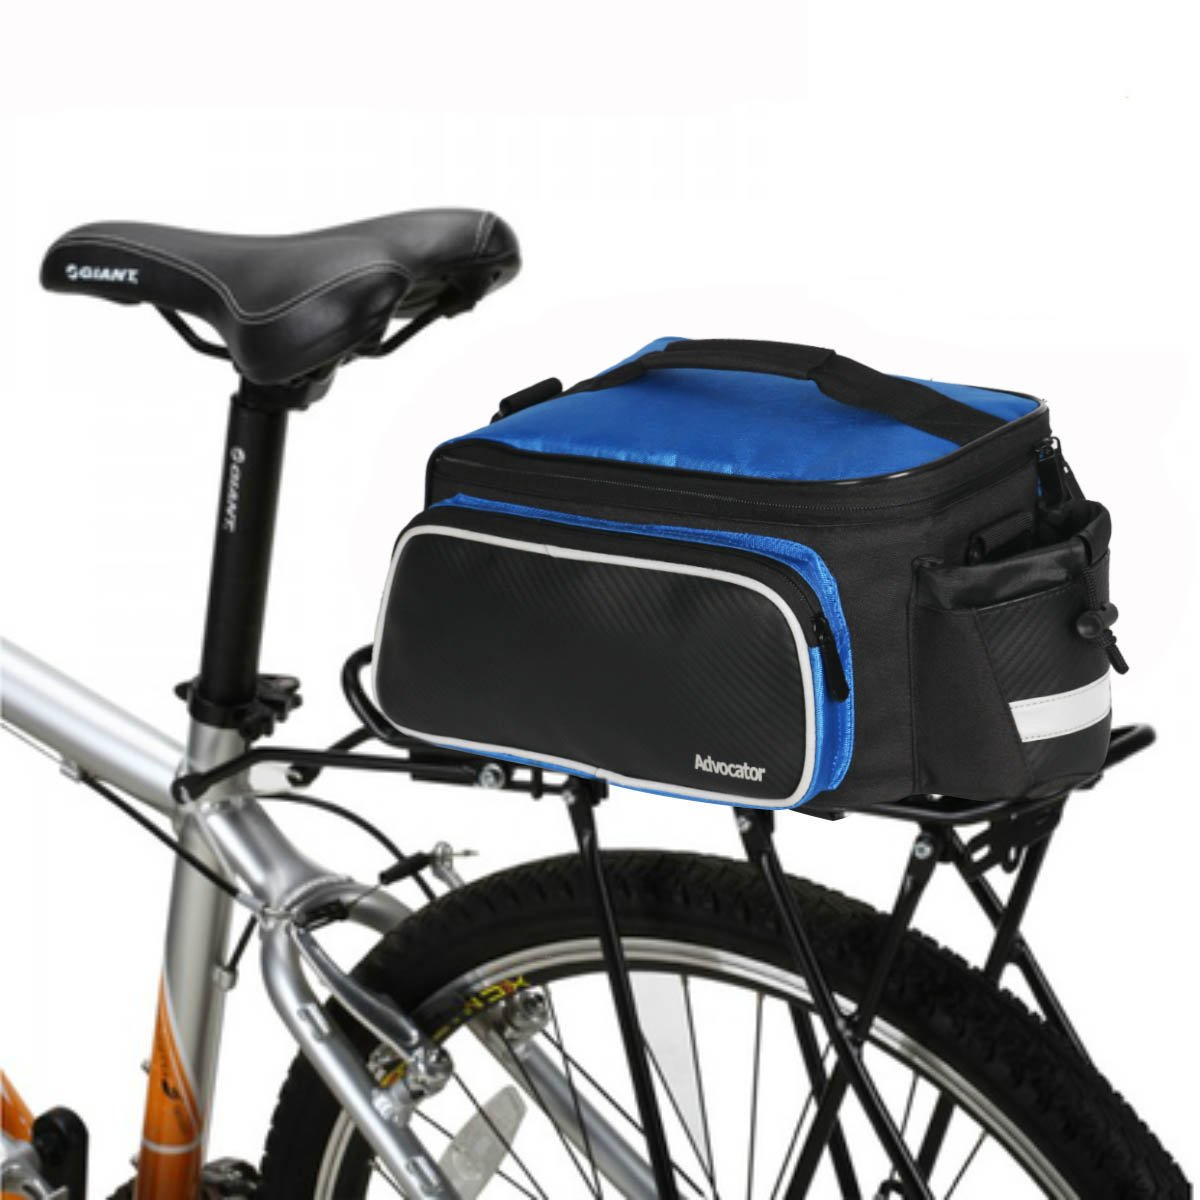 Advocator 20-35L Durable Bike Pannier Bag Shoulder Strap Rack Rear Trunk Tote Bag Shoulder Strap Tail Back Seat Storage Package Bicycle Bike Rear Trunk Bag Bike Accessories